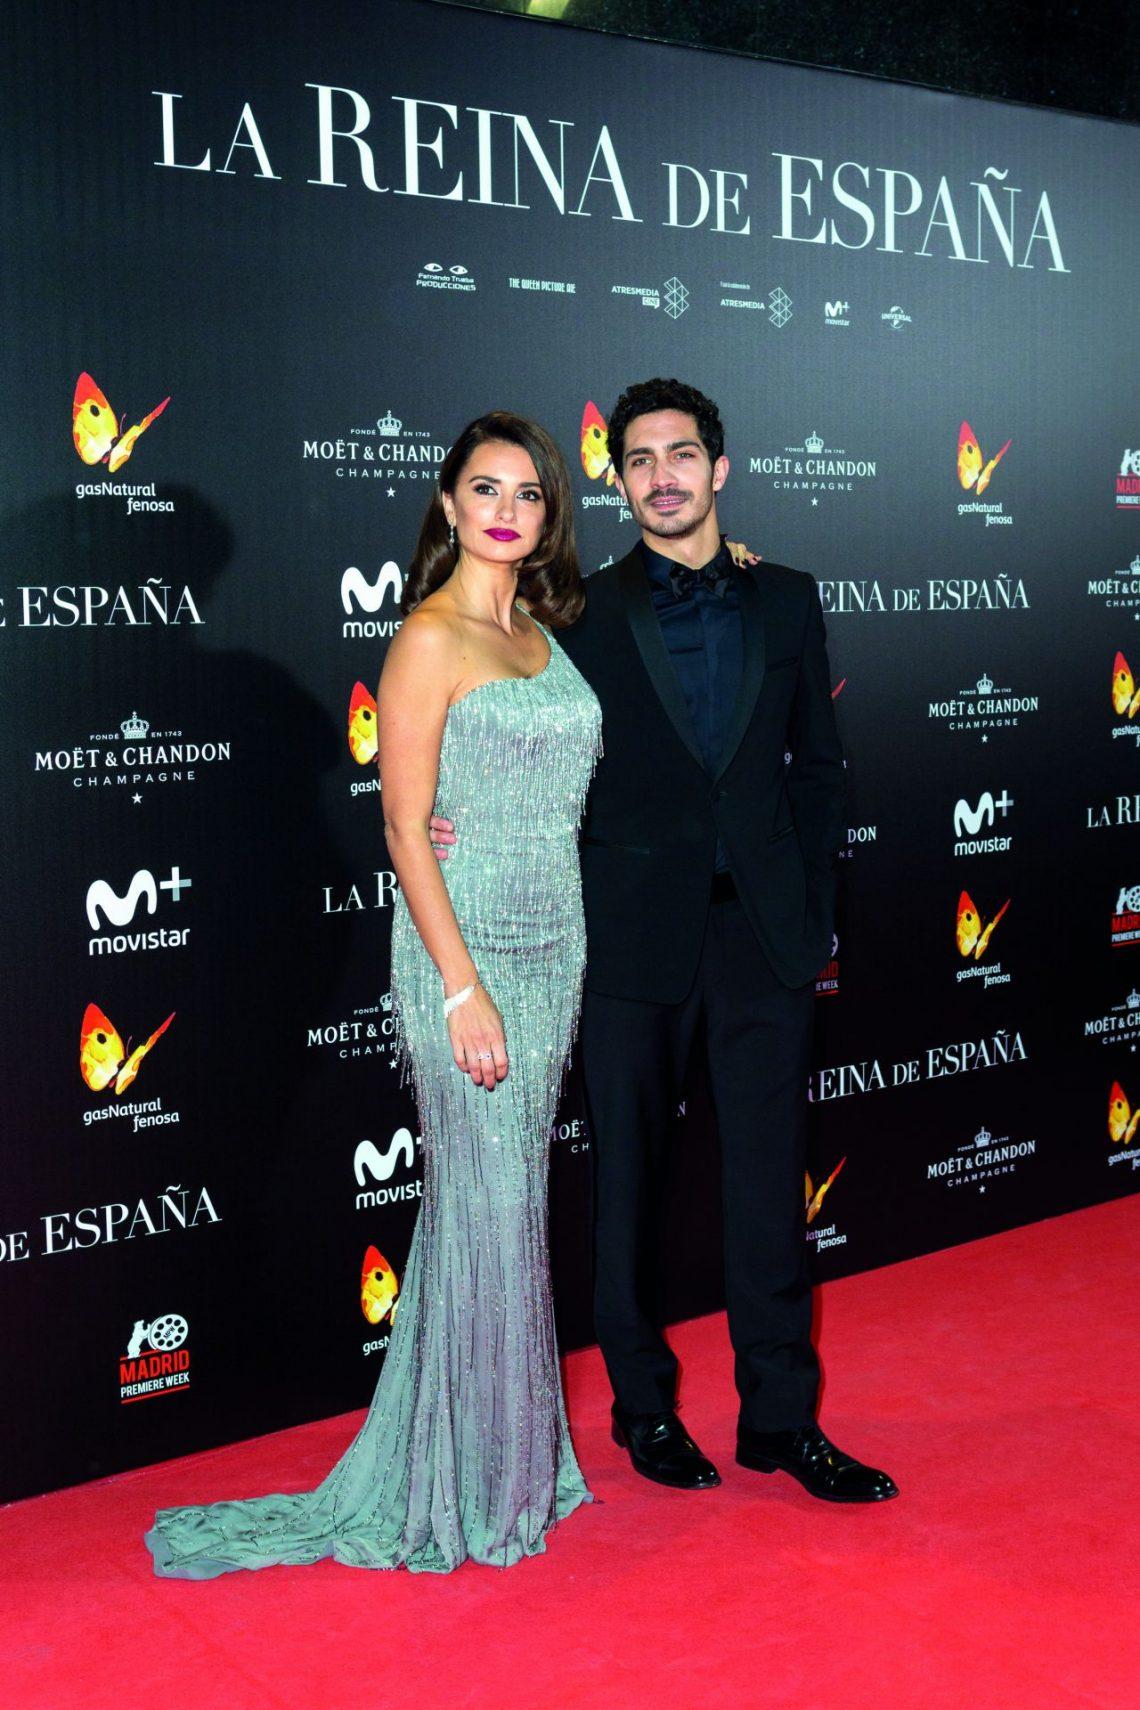 Penélope Cruz deslumbra en la alfombra roja de la première 'La Reina de España'